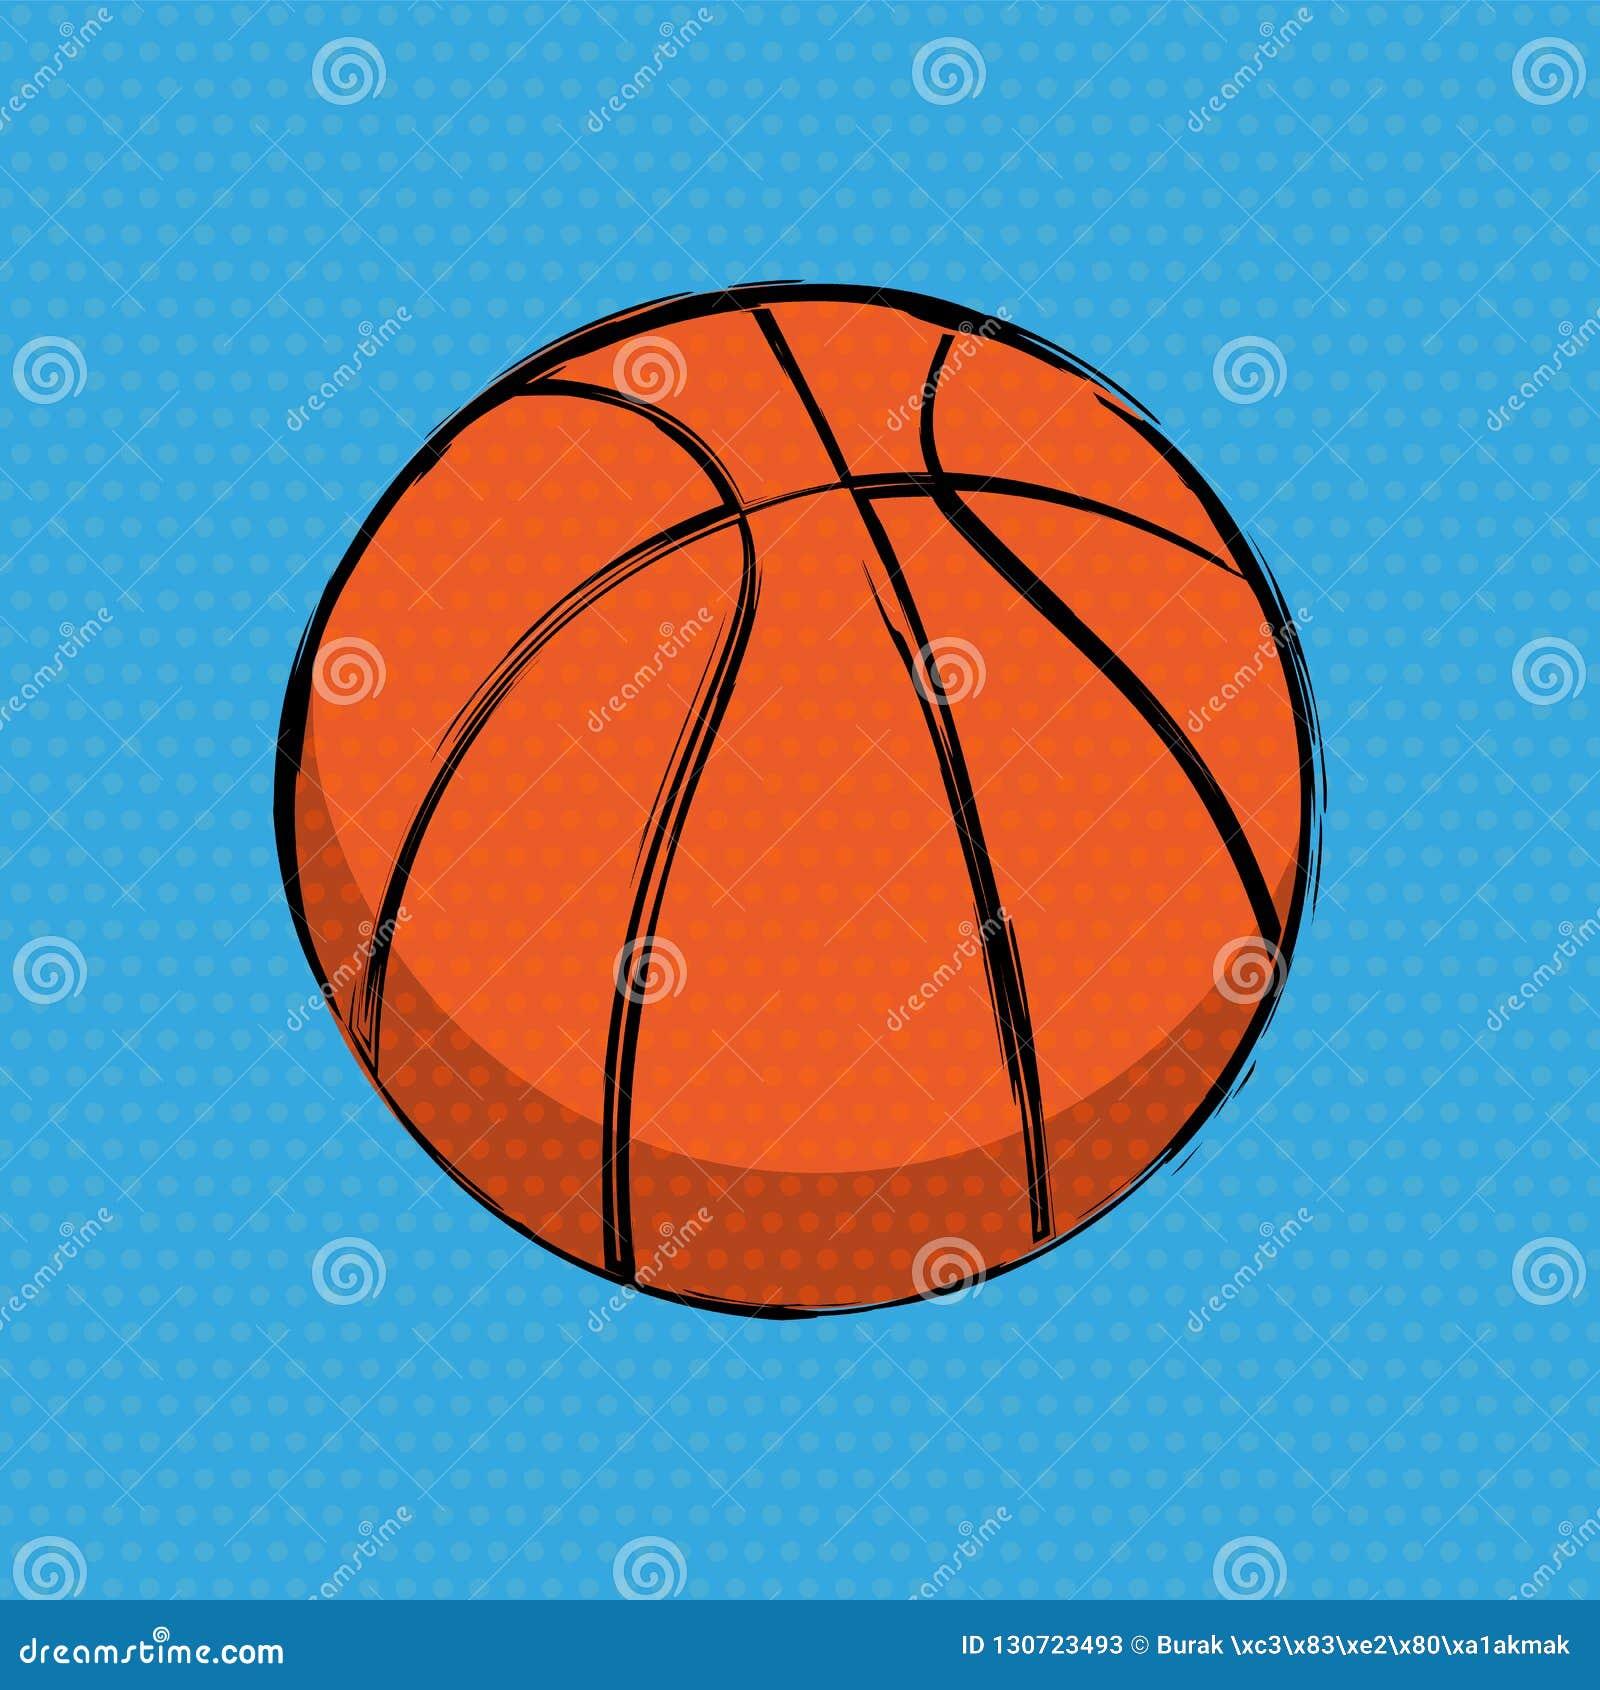 Orange Basketball Comics Background